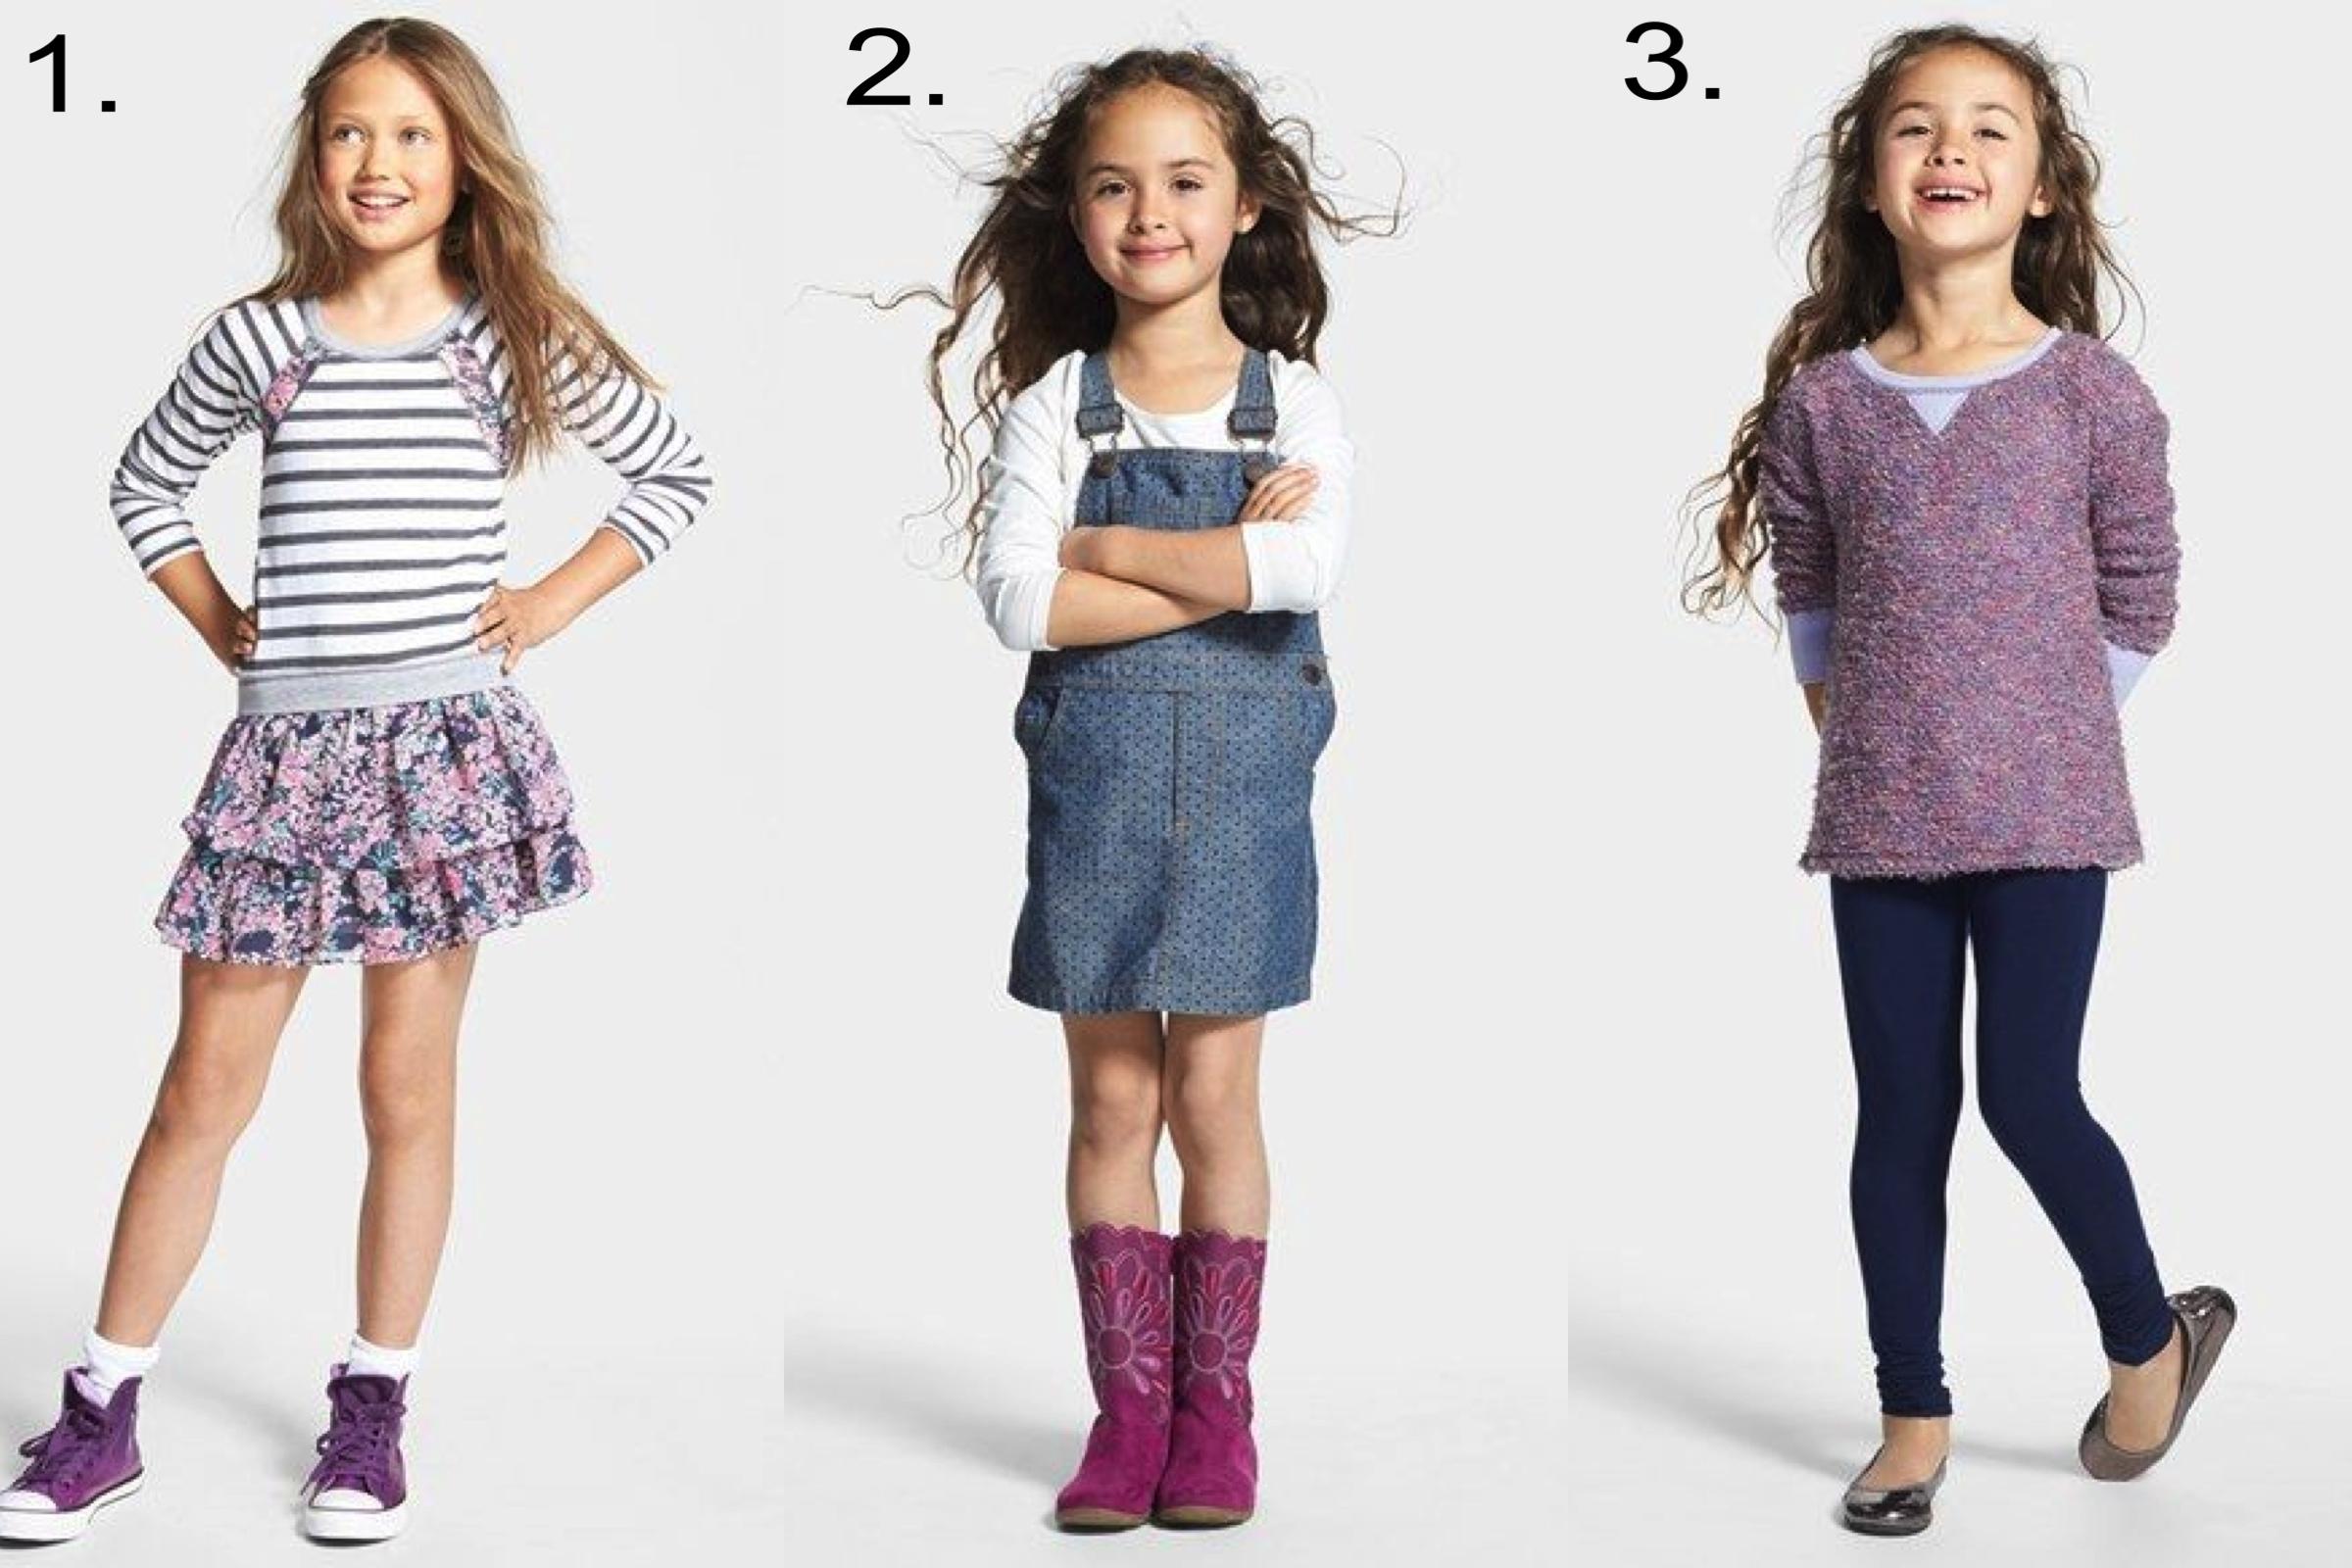 Favorite Girls' Sale @  nordstrom.com   1.  Truly Me Ruffle Dress & Converse High Top Sneaker   2.  Tucker + Tate Overall Dress & Long Sleeve Tee   3.  Splendid Tunic Top & Leggings, Ruby & Bloom Leather Flat